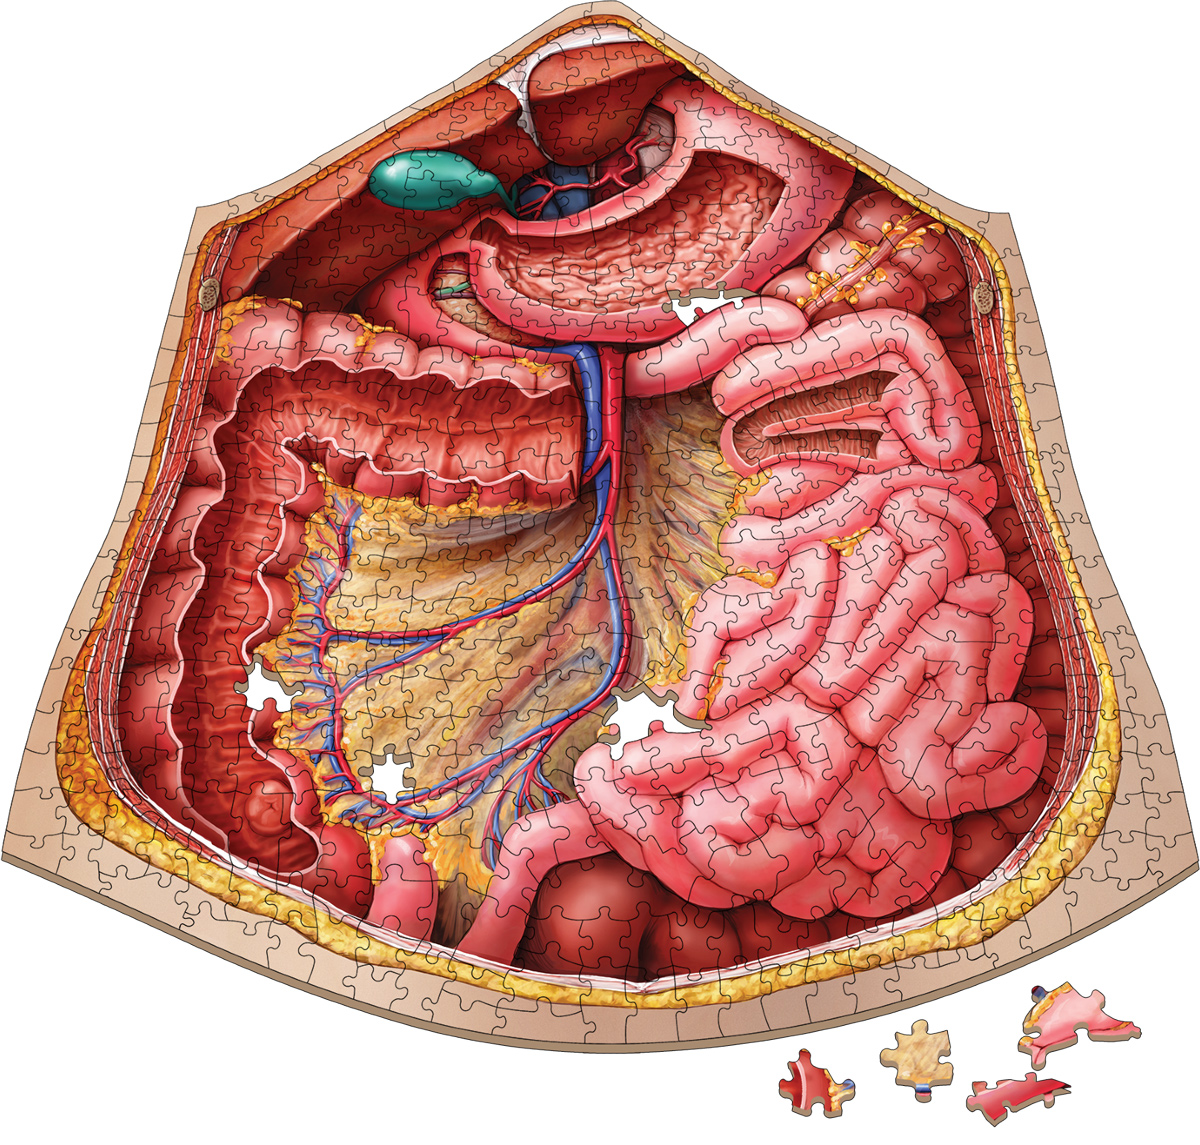 Dr. Livingston's Anatomy Jigsaw Puzzle: The Human Abdomen Anatomy & Biology Shaped Puzzle